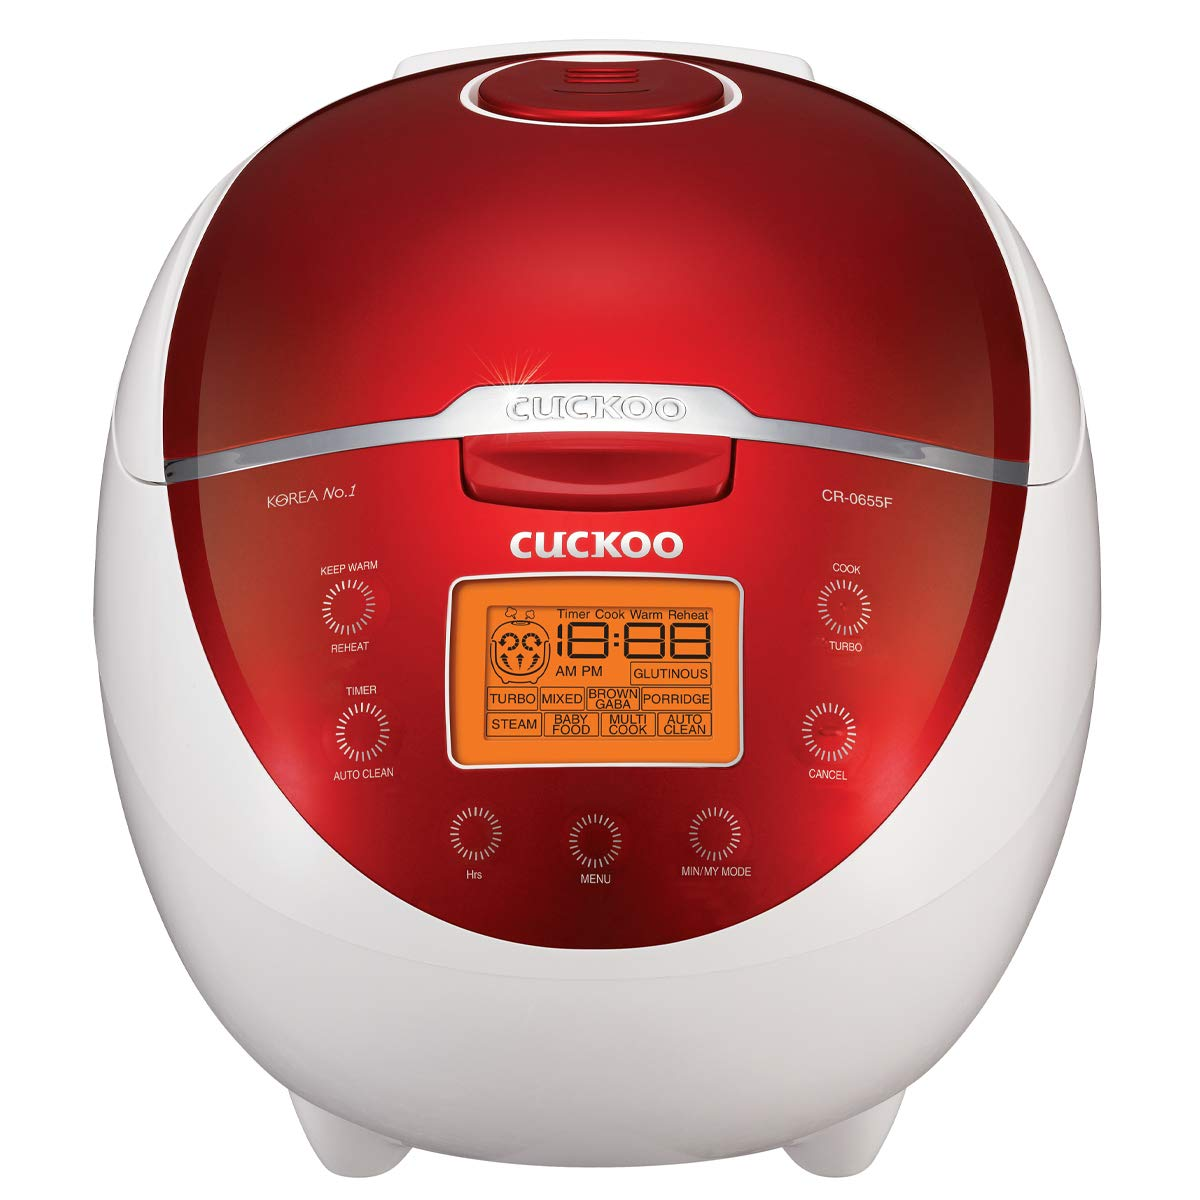 Cuckoo CR-0655F Rice Cooker 1.08 Liters / 1.5 Quarts